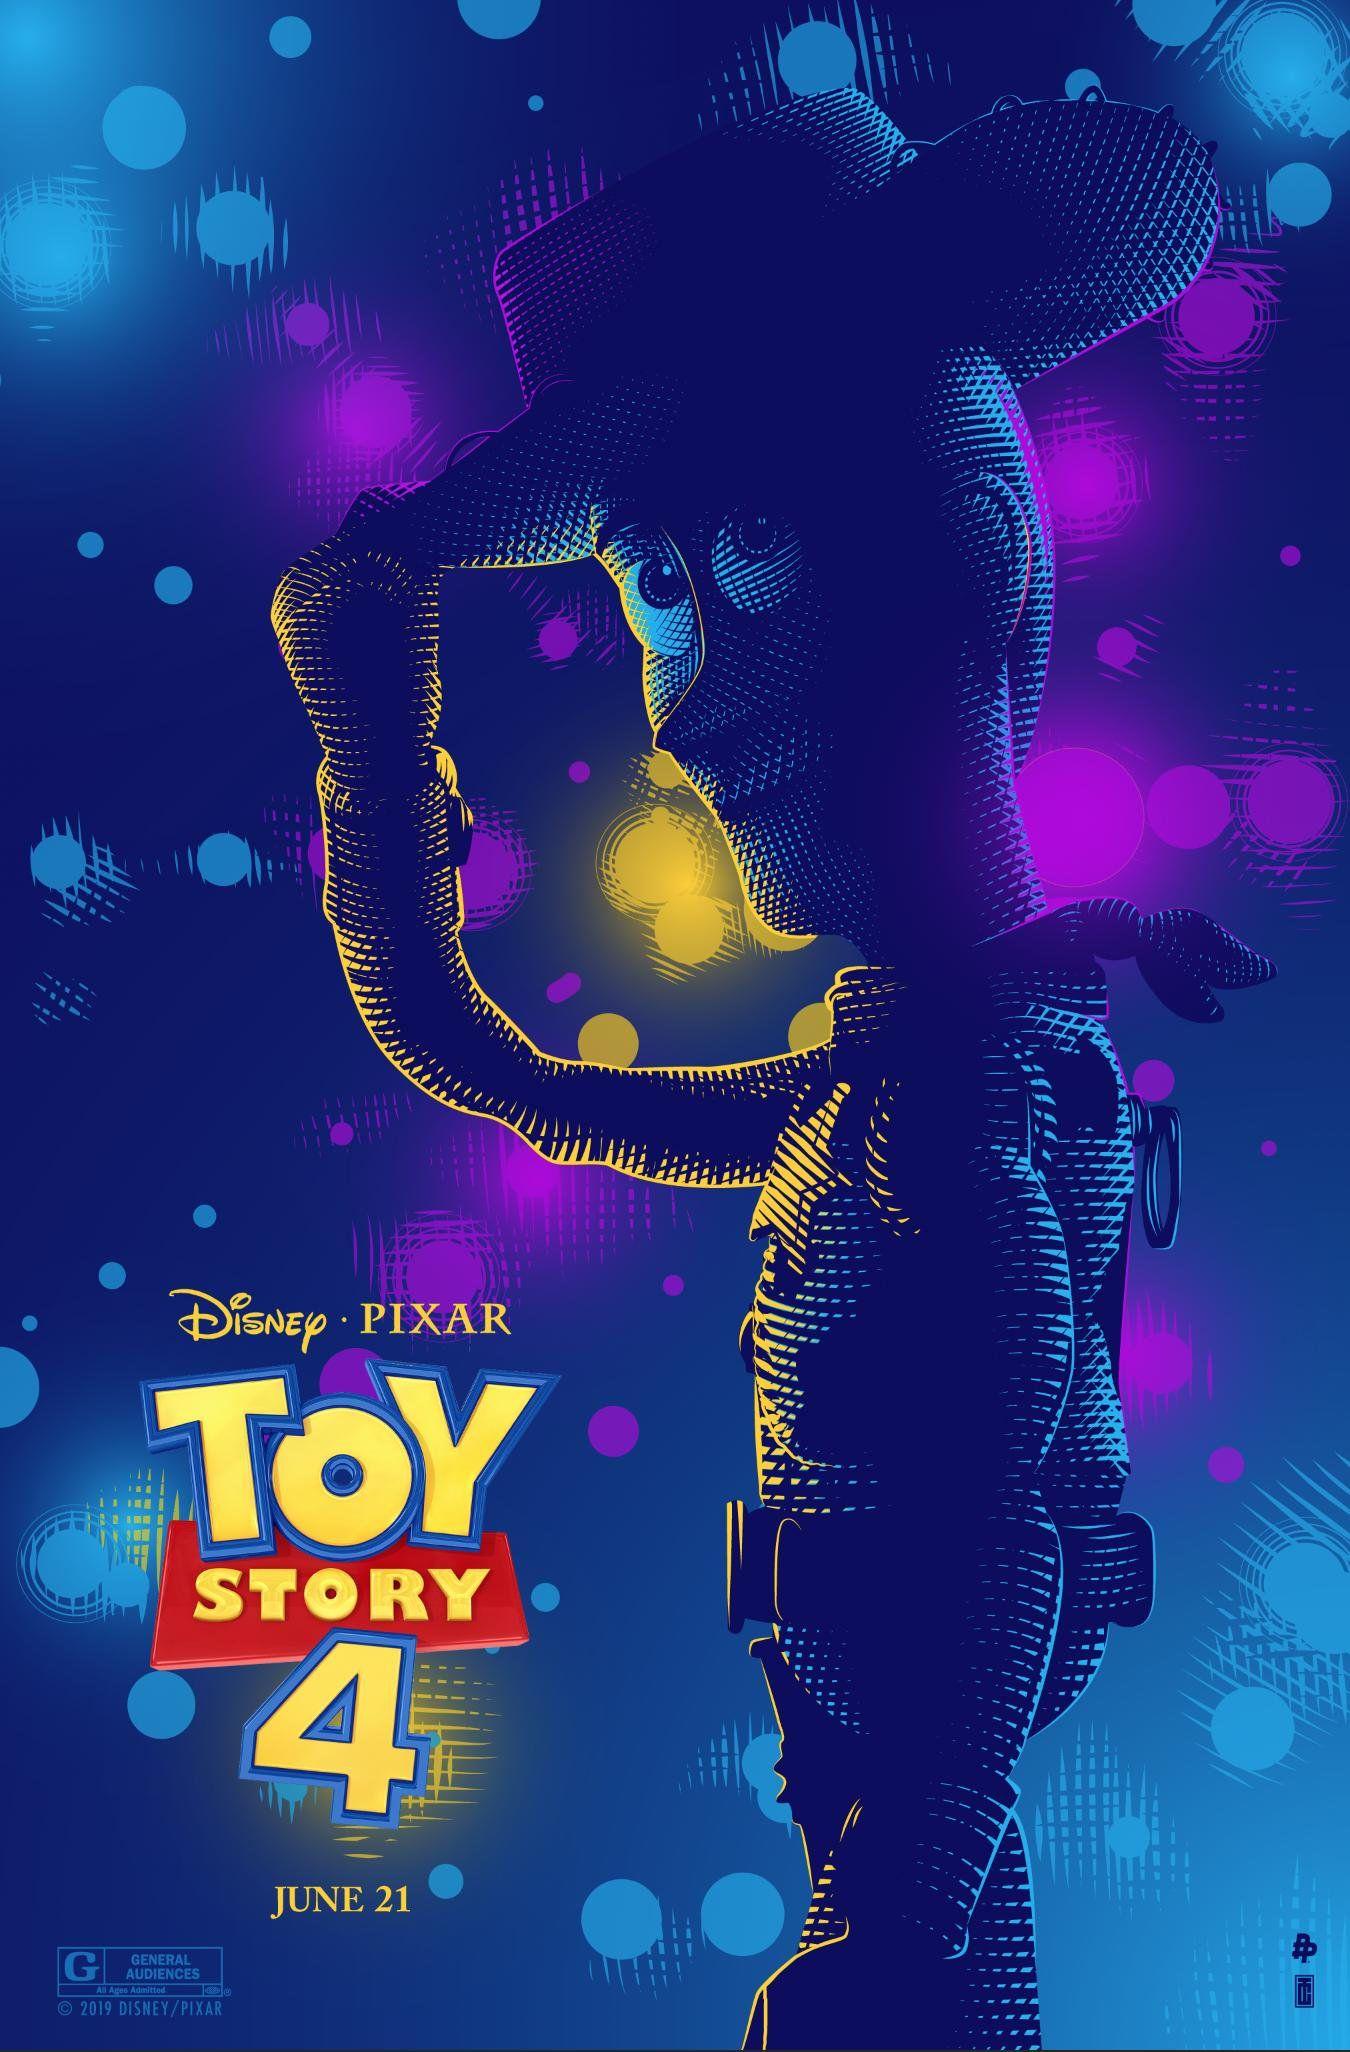 Toy Story 4 | Dessin princesse disney, Dessin animé et Toy story